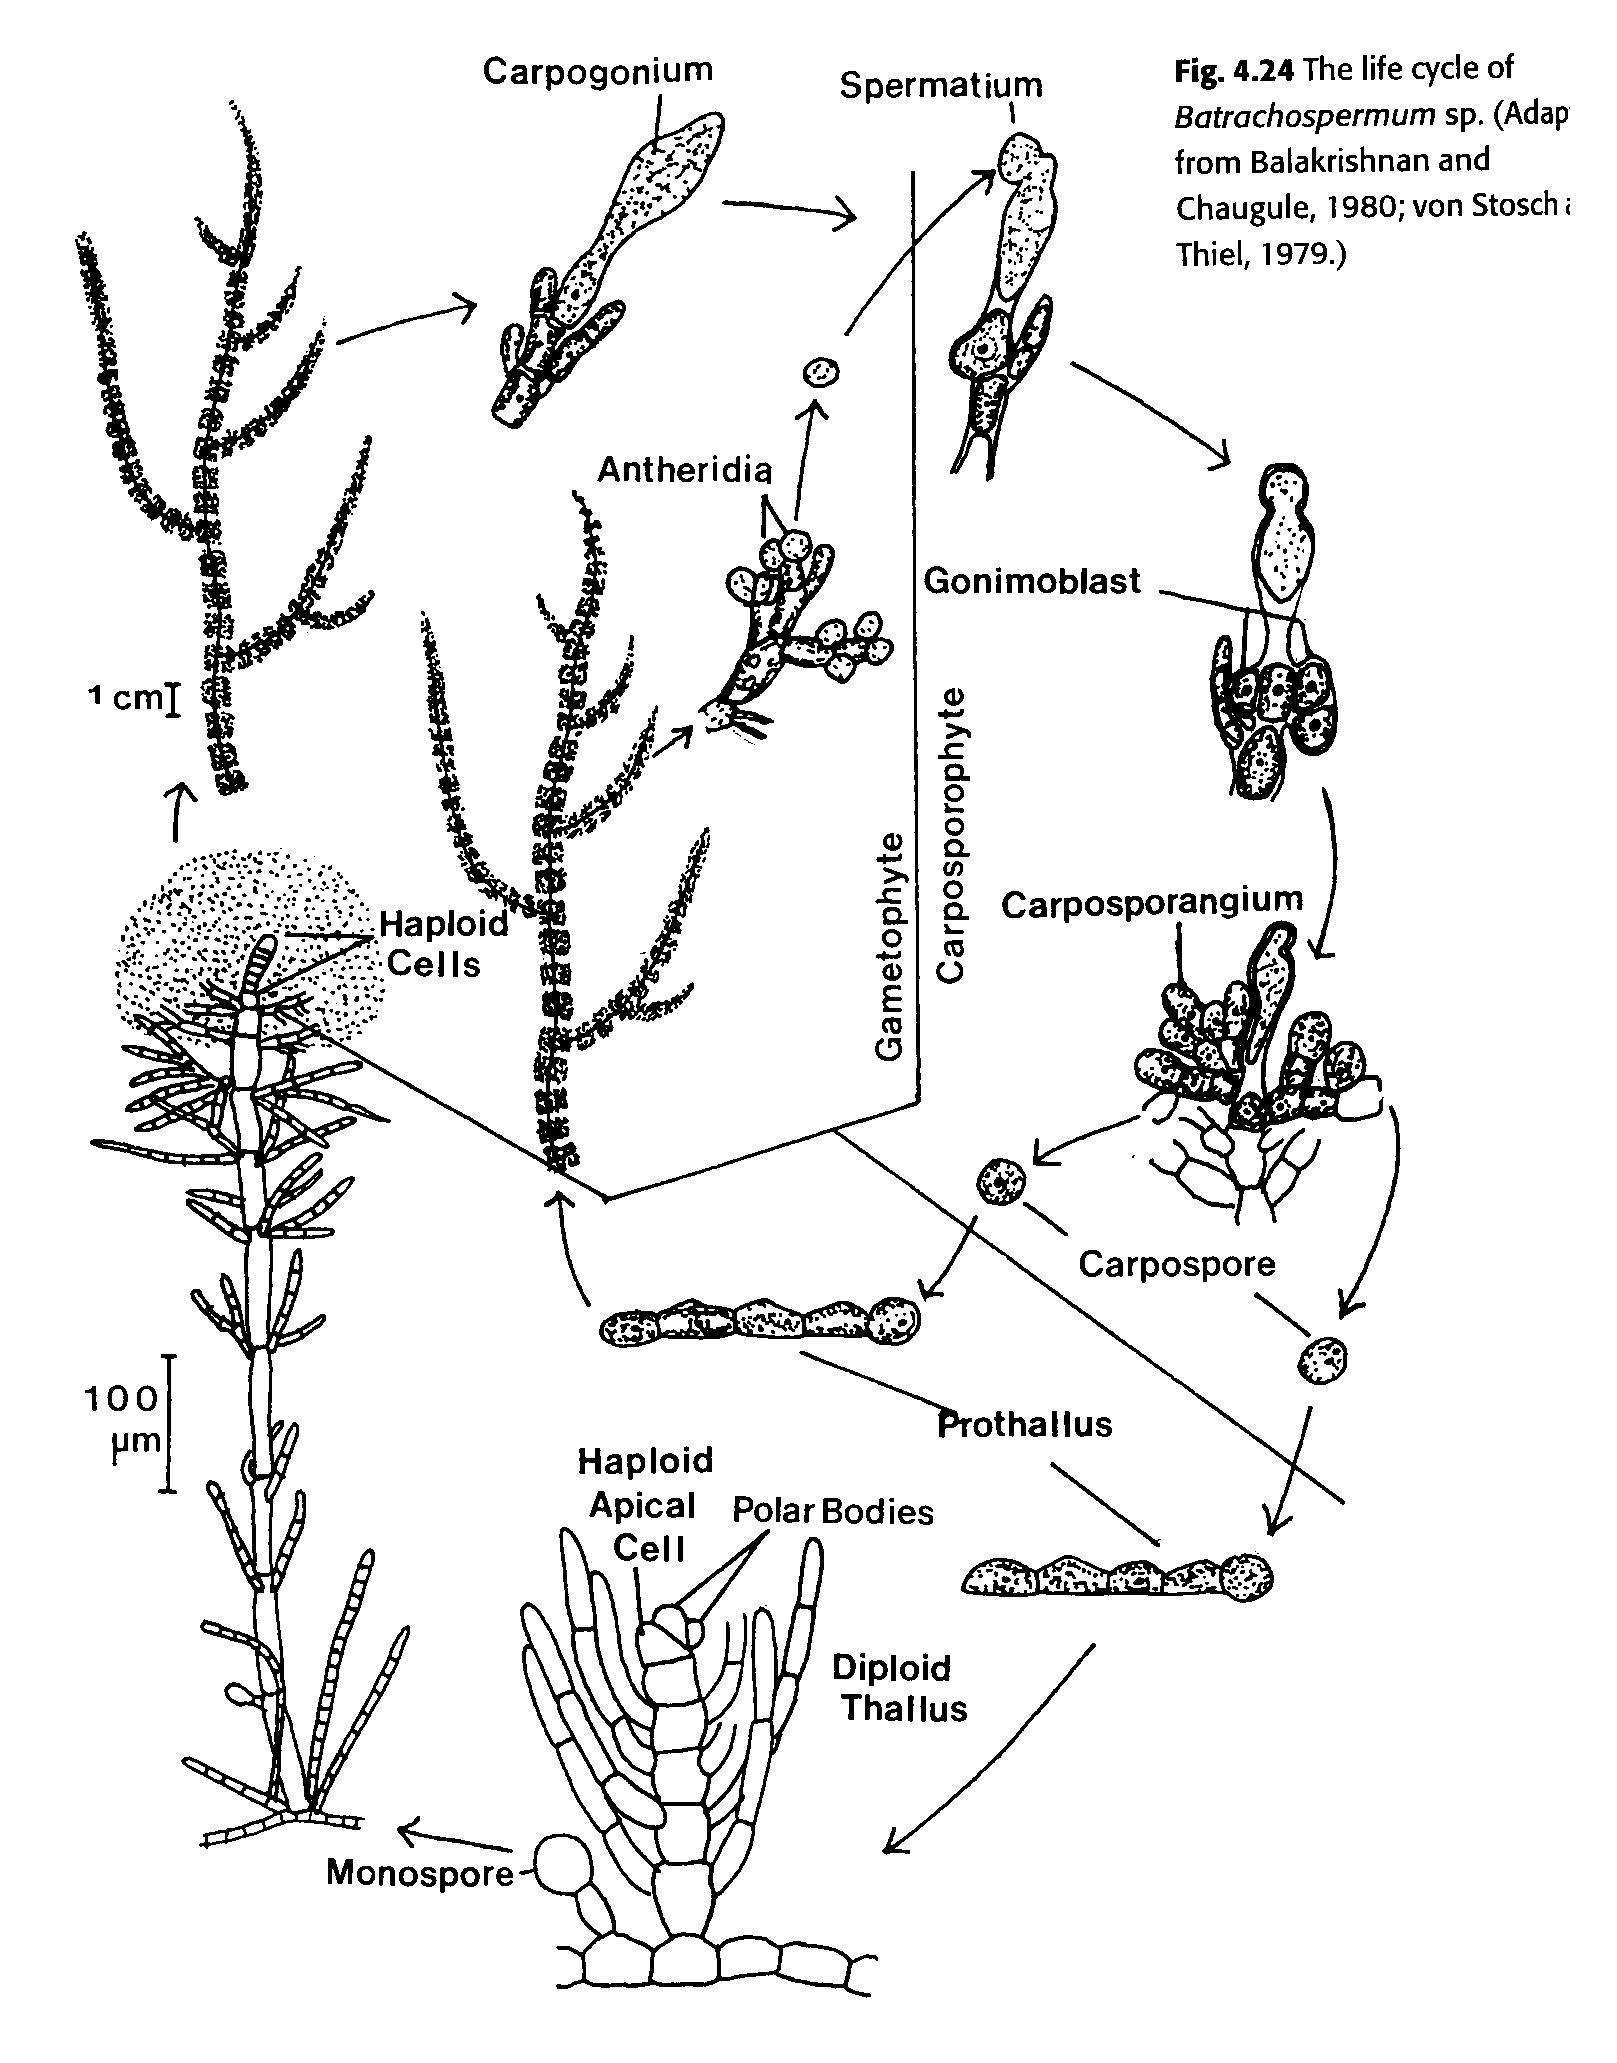 diatomeae narod ru pictures html oedogonium life cycle http diatomeae    Oedogonium Life Cycle